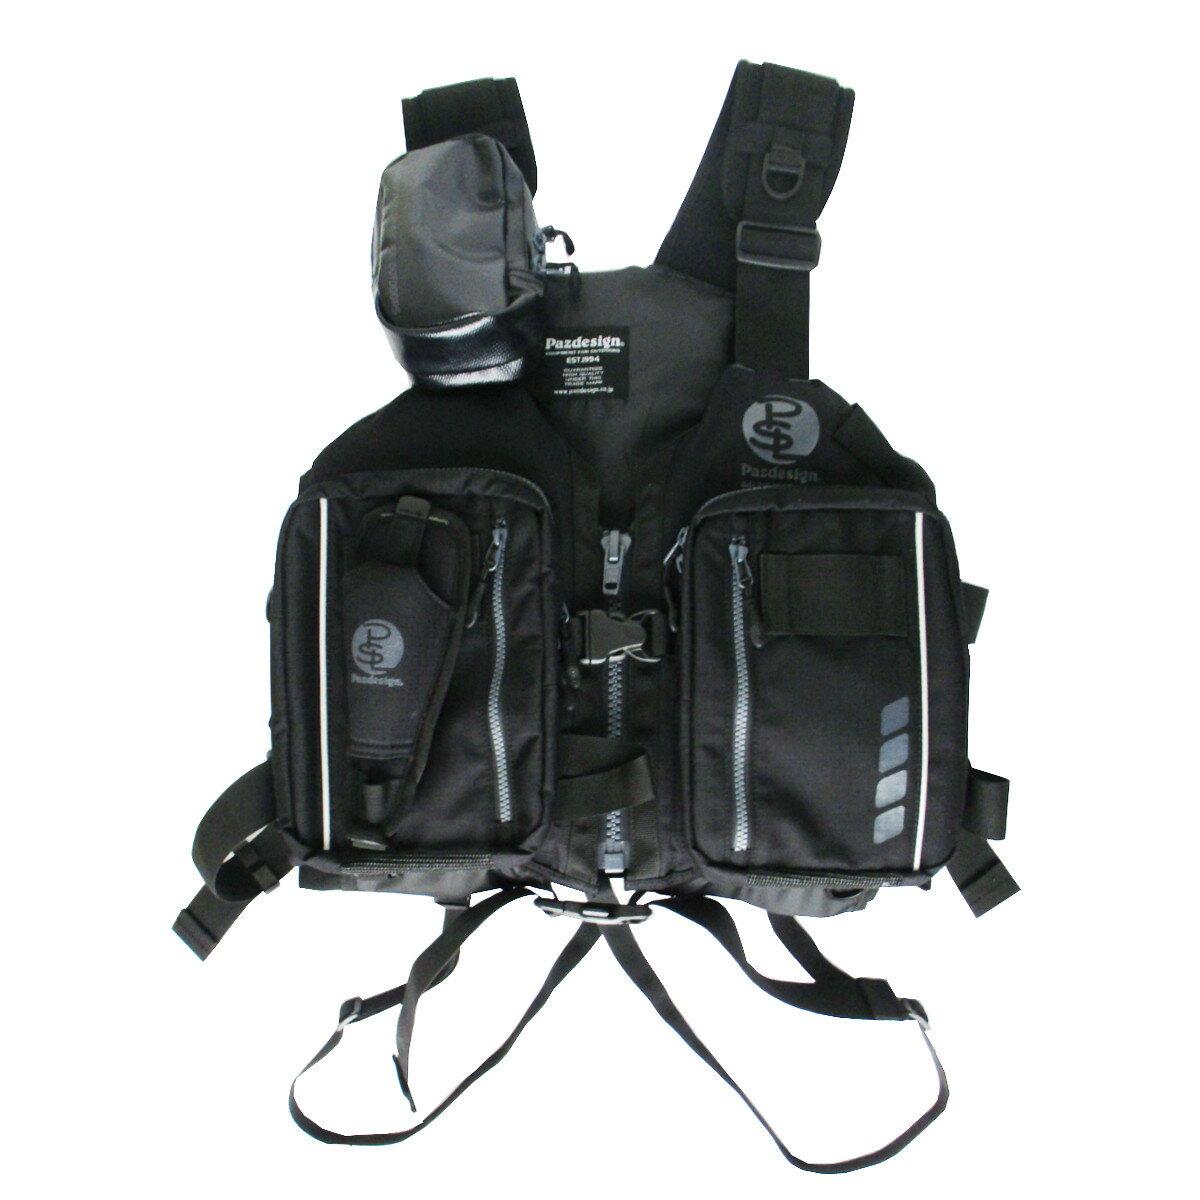 Pazdesign アルティメット V-3 SLV-025 フリー ブラック(東日本店)